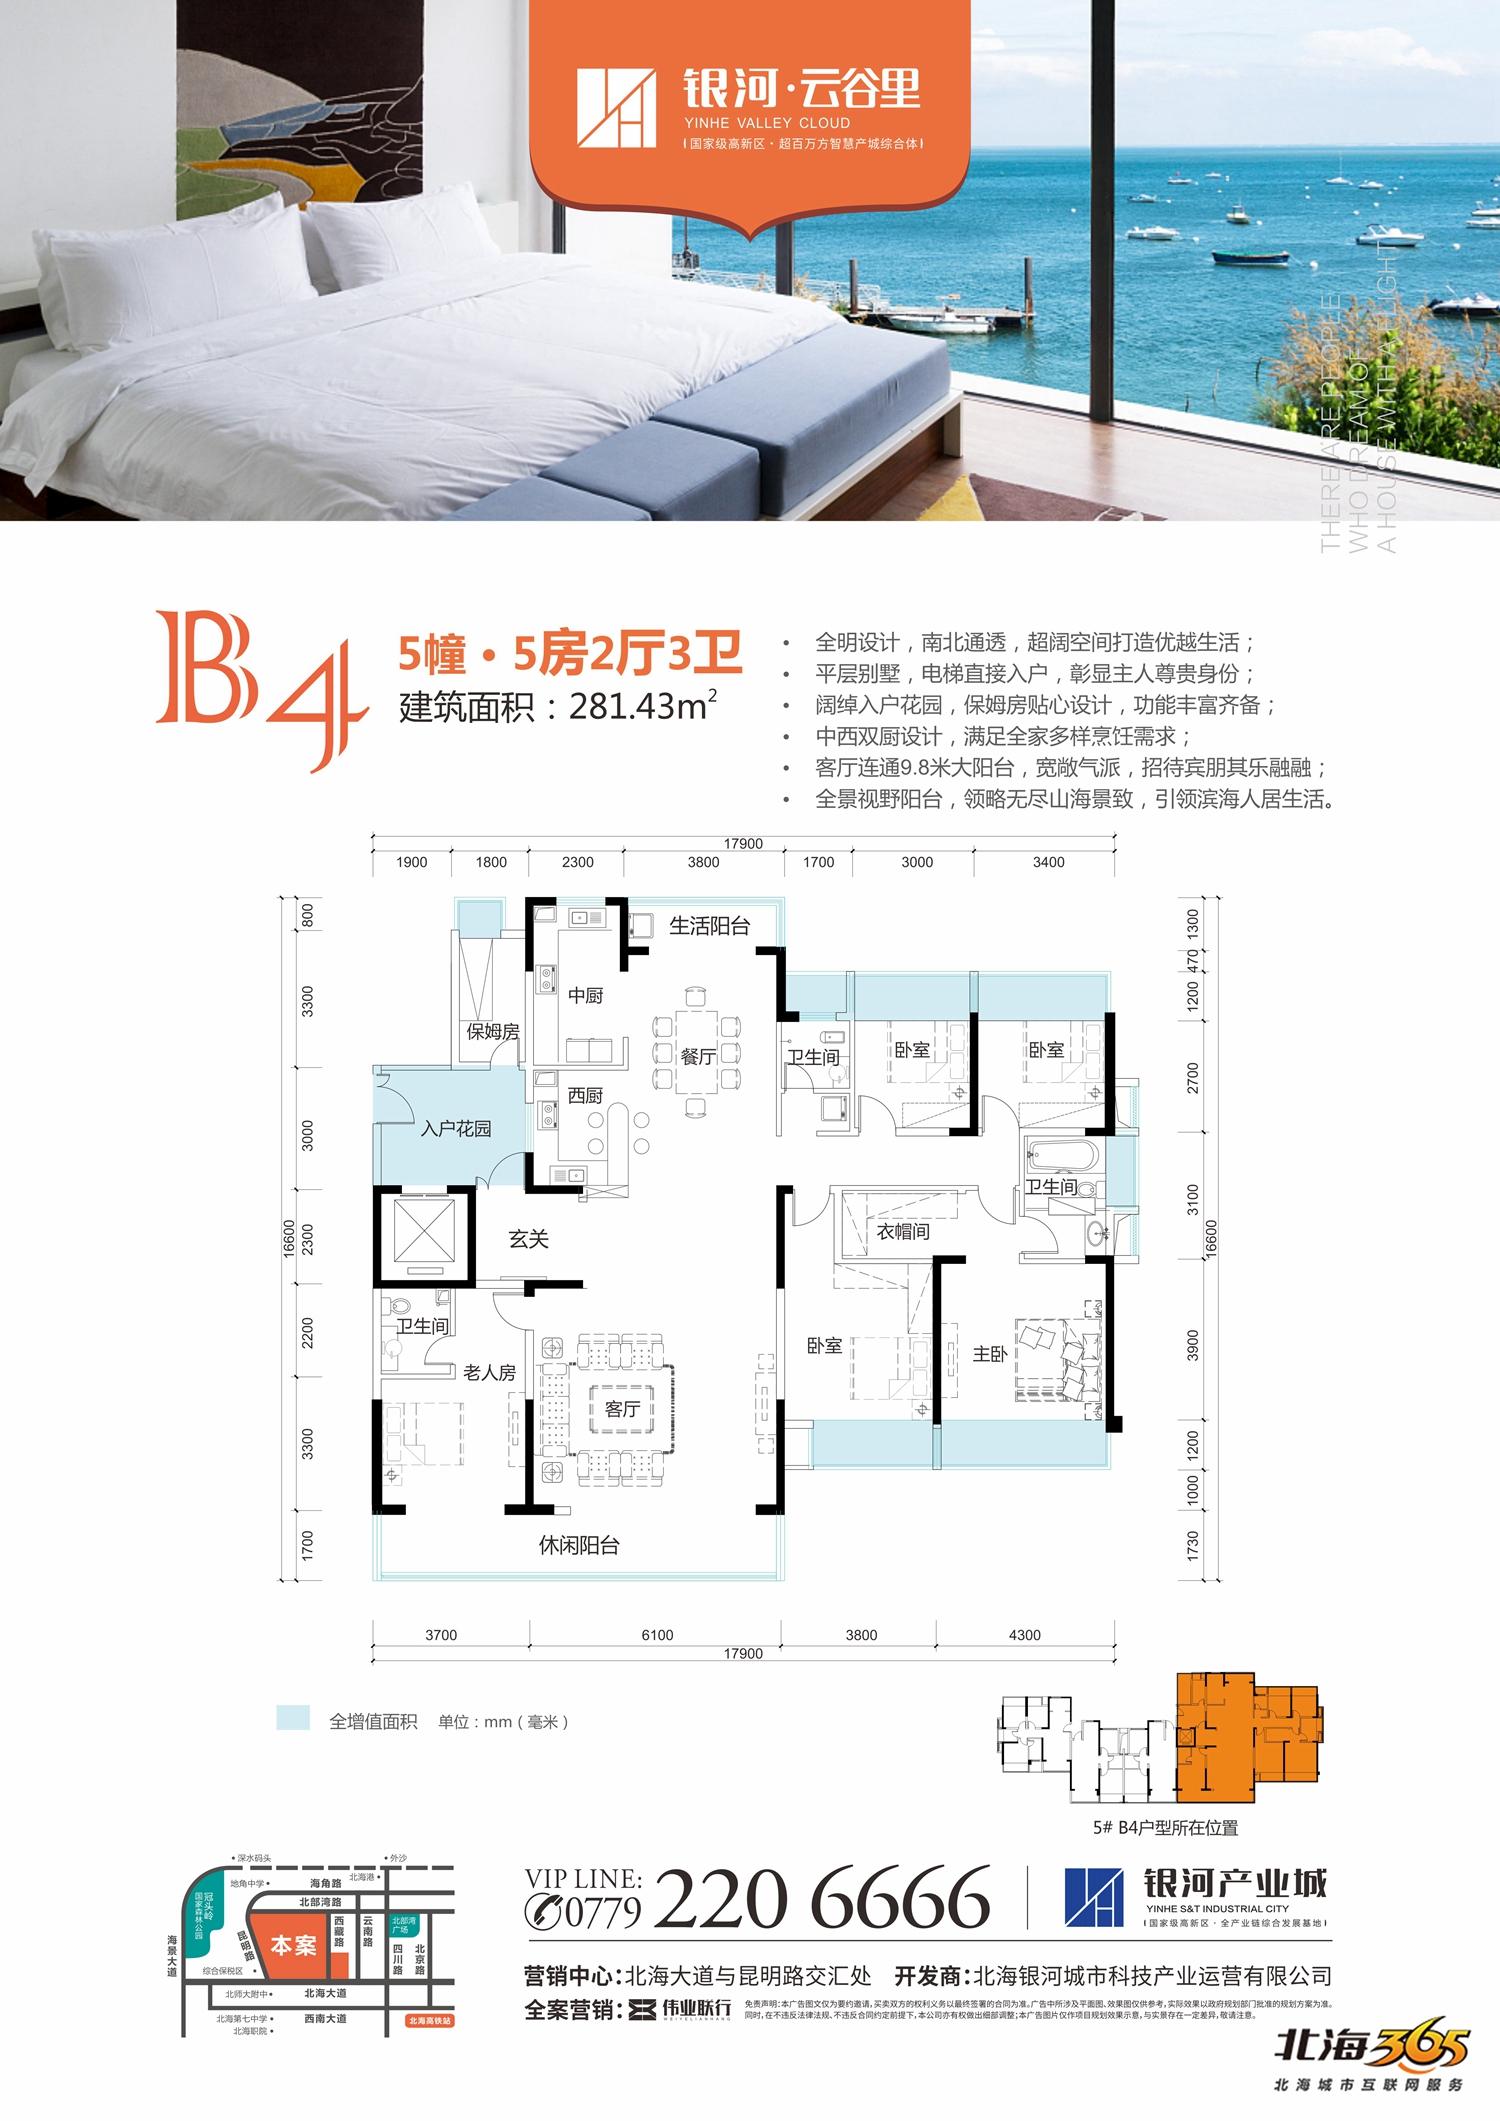 B4-5幢-5房2厅3卫